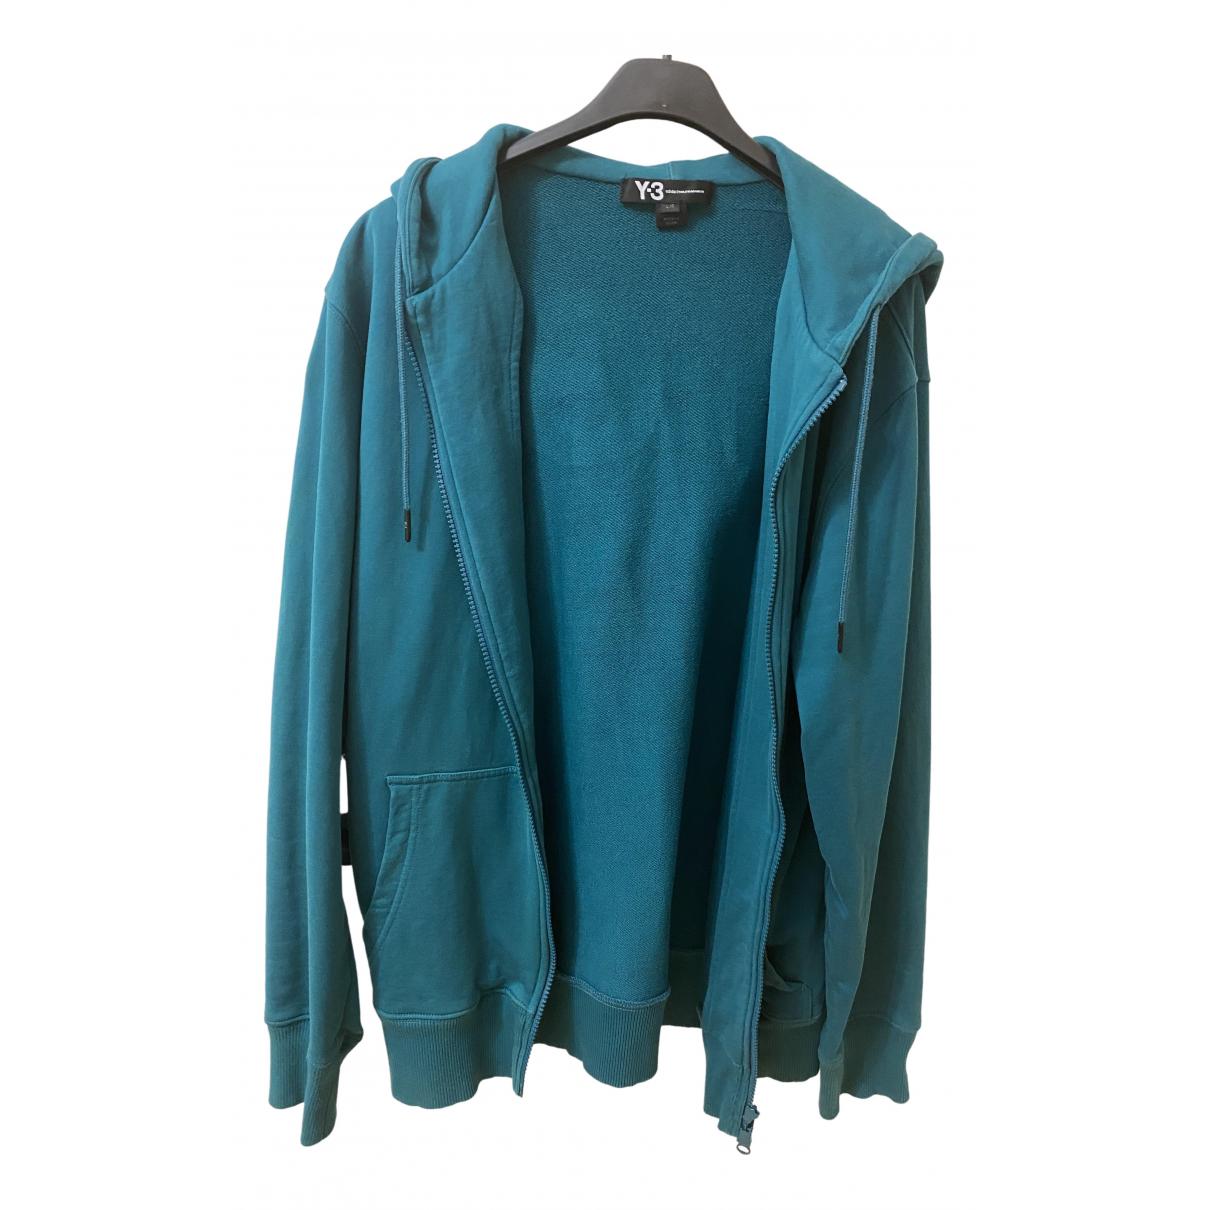 Y-3 N Blue Cotton Knitwear & Sweatshirts for Men L International